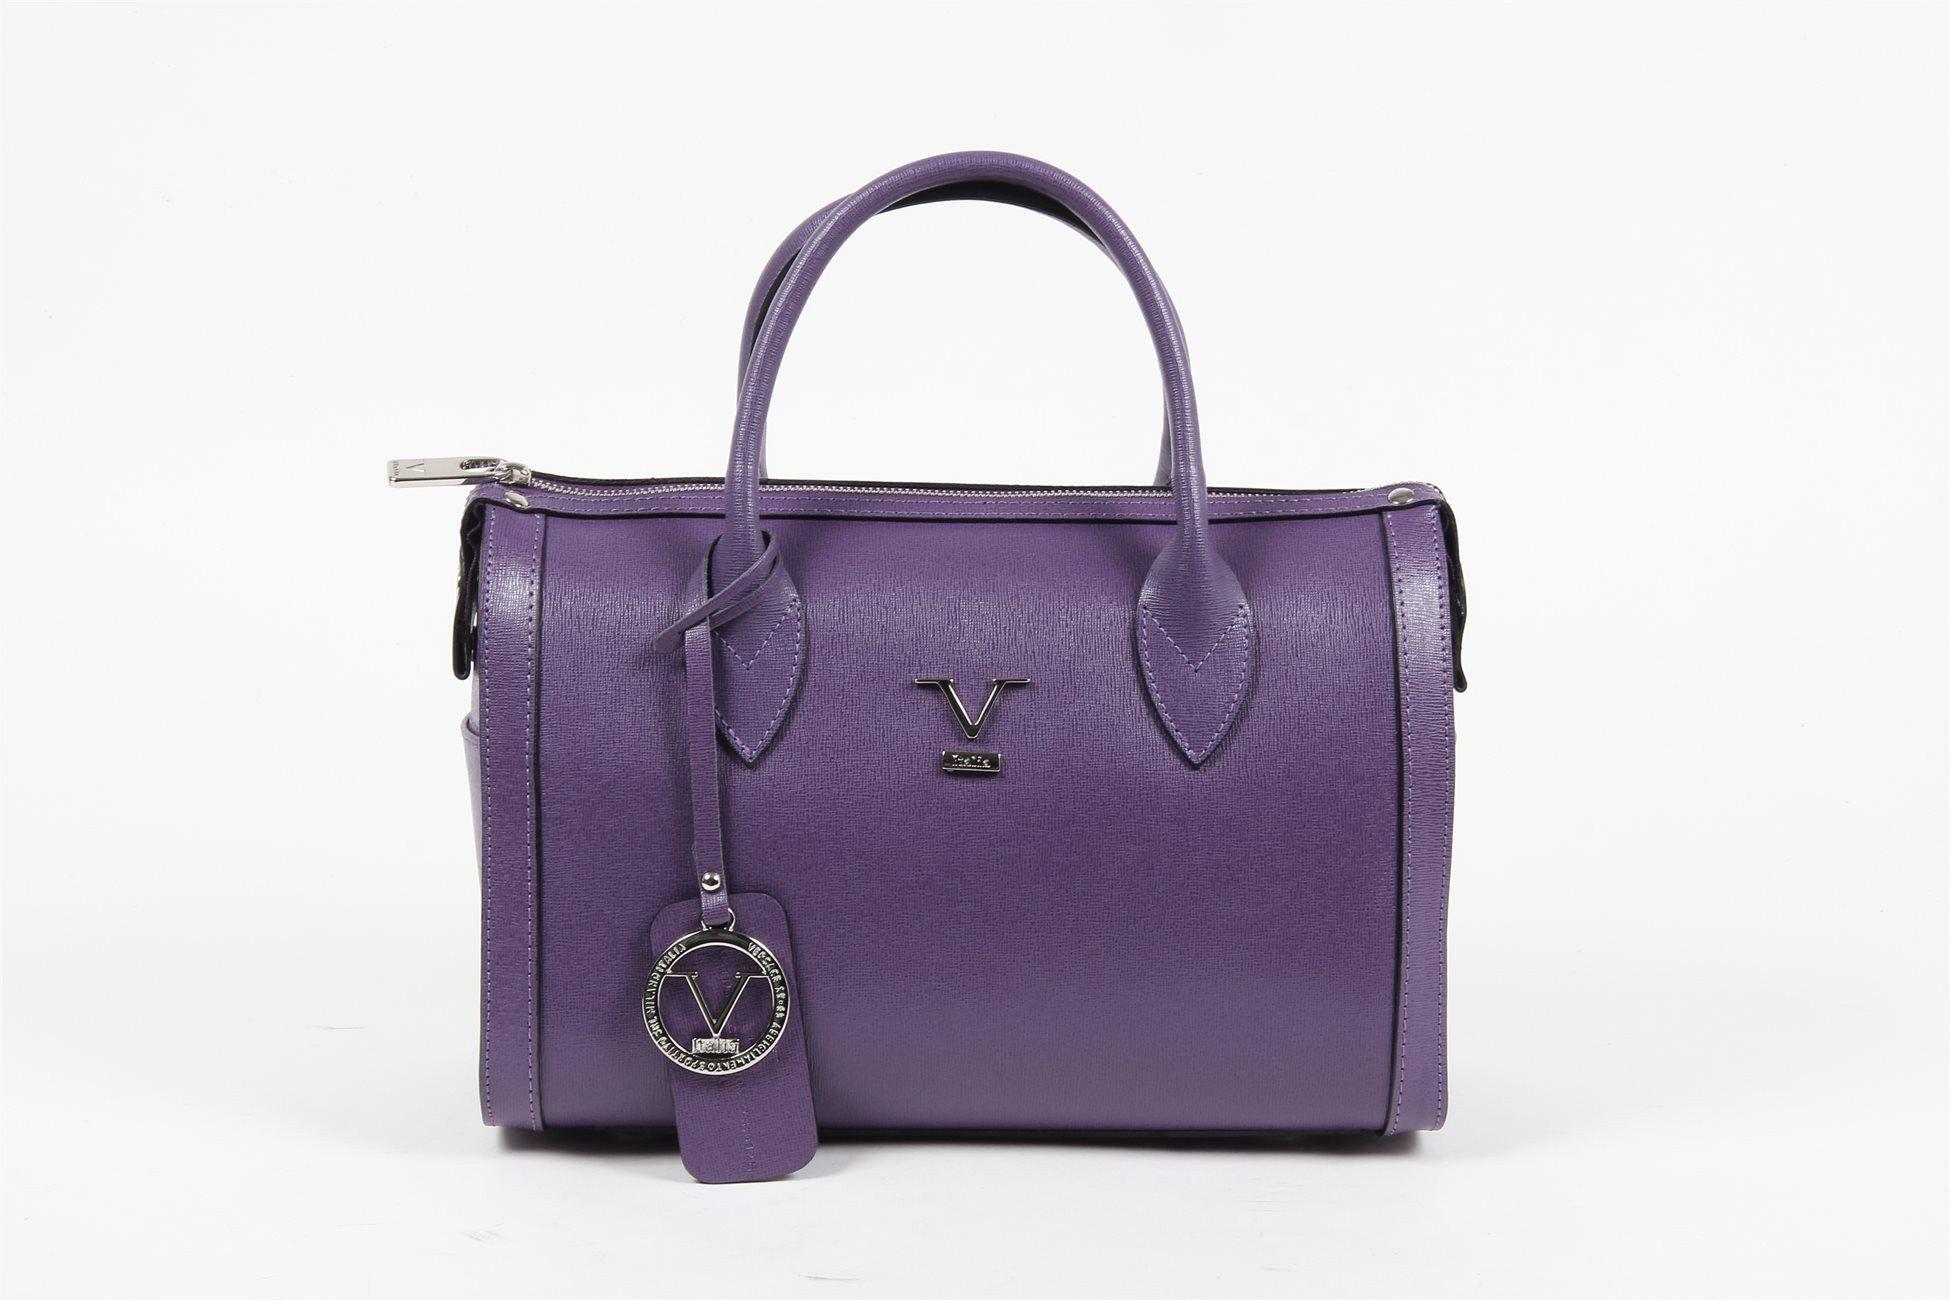 Versace 19.69 Abbigliamento Sportivo Srl Milano Italia Womens Handbag V014  S PURPLE 90b2e4019bee4